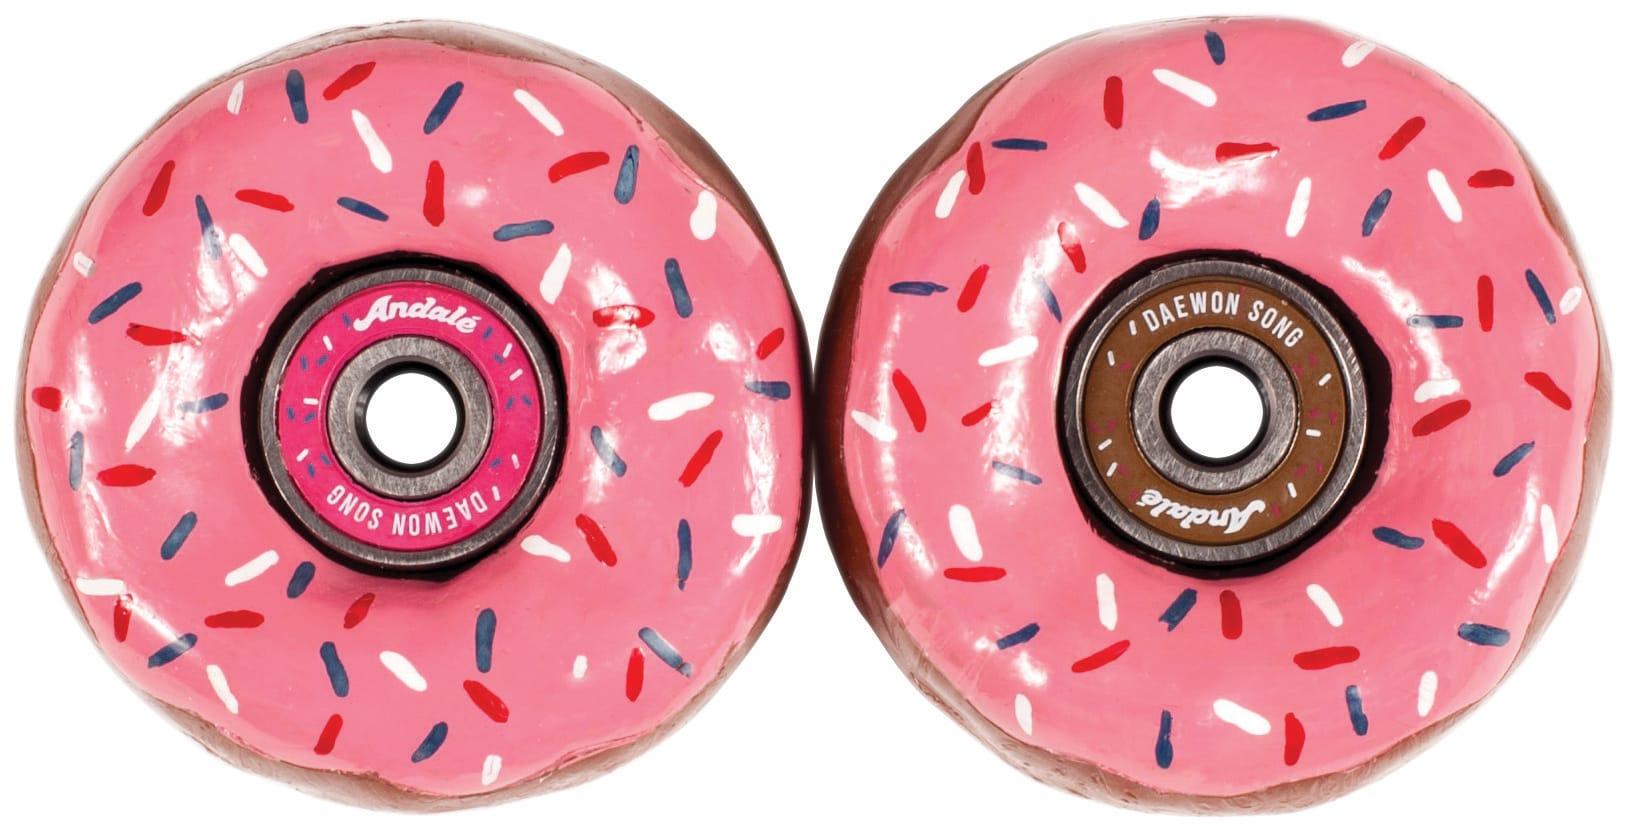 Image of Andale Daewon's Donuts Skateboard Bearings w/ Wax